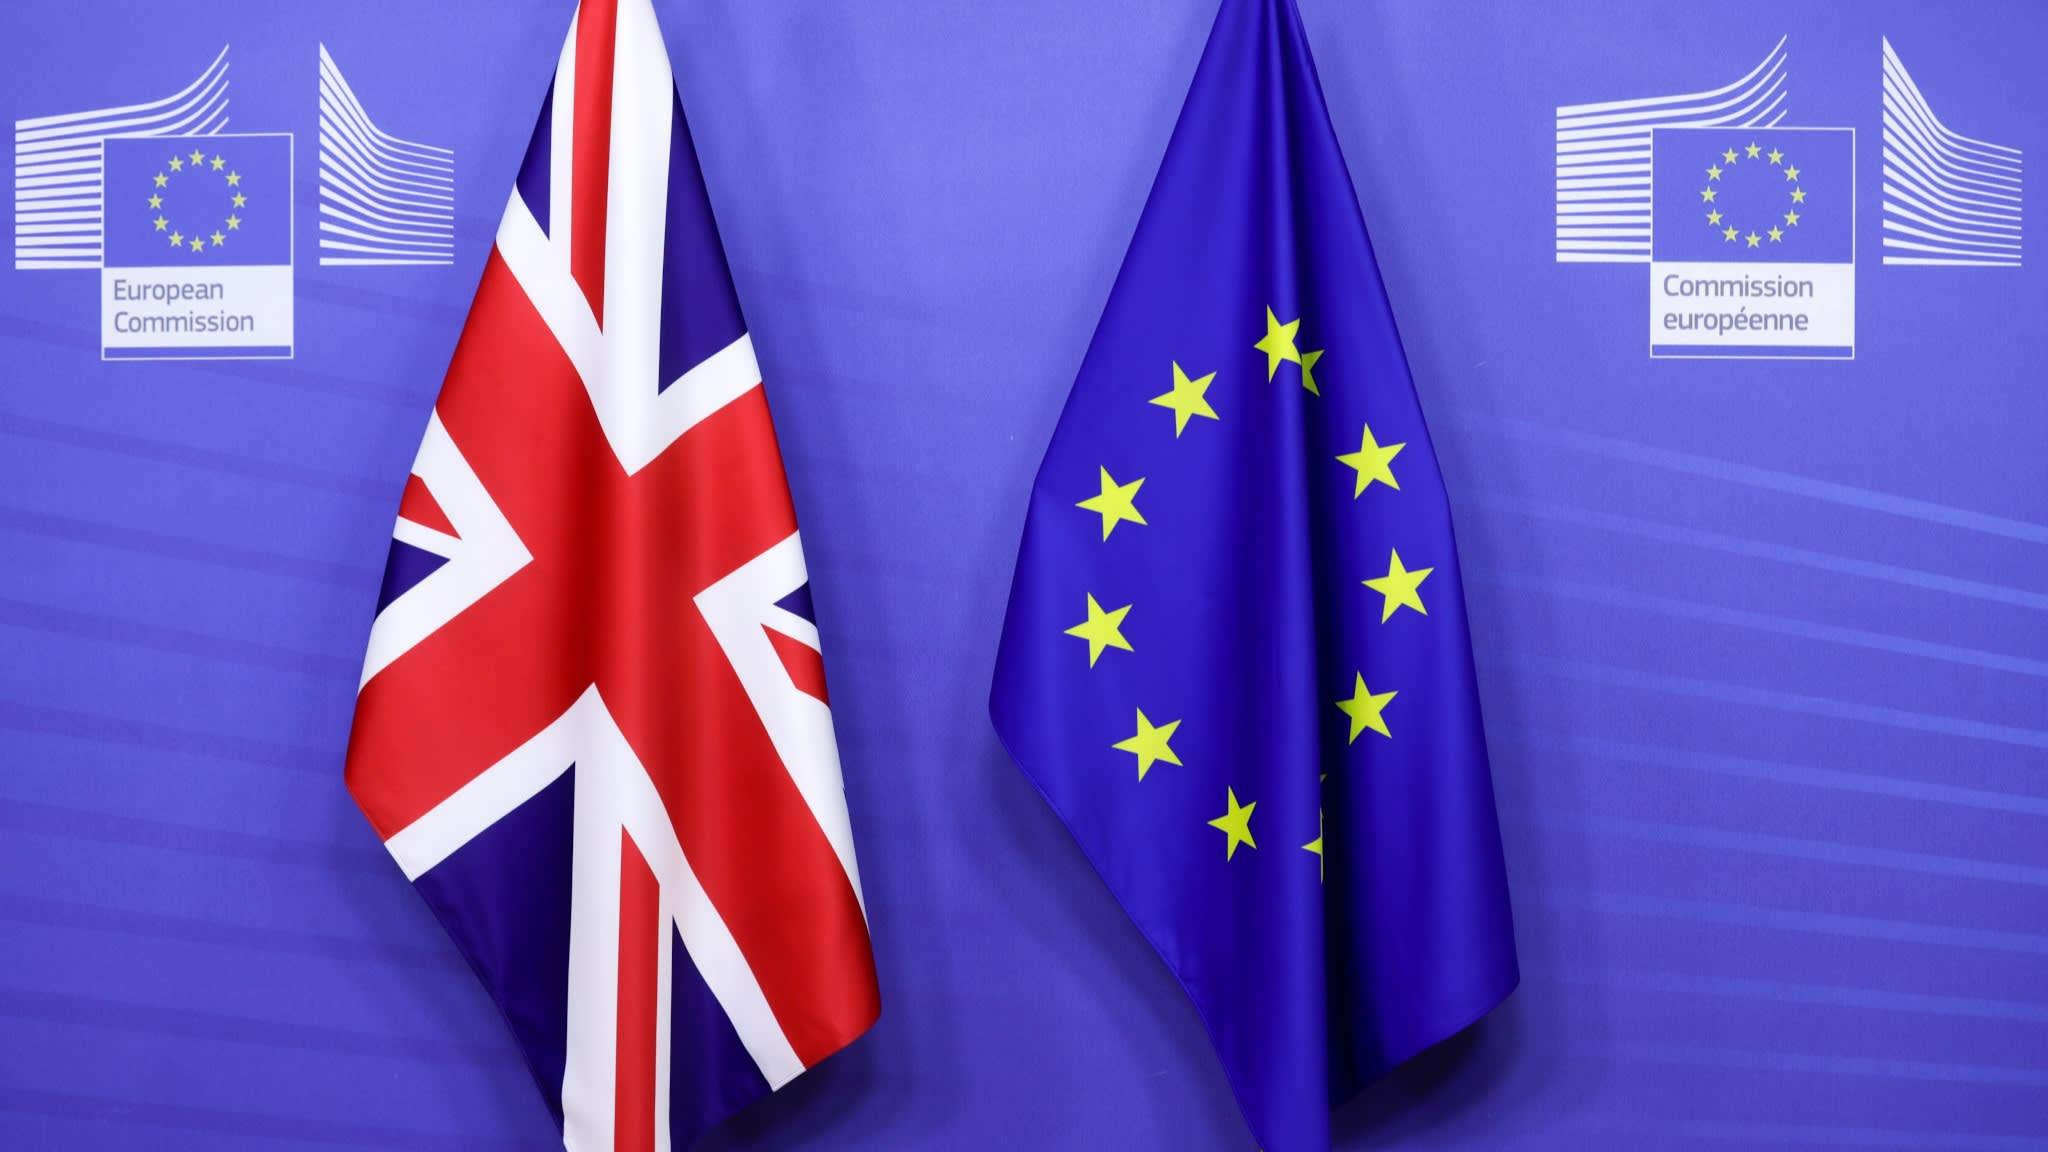 accordo commerciale EU-UK